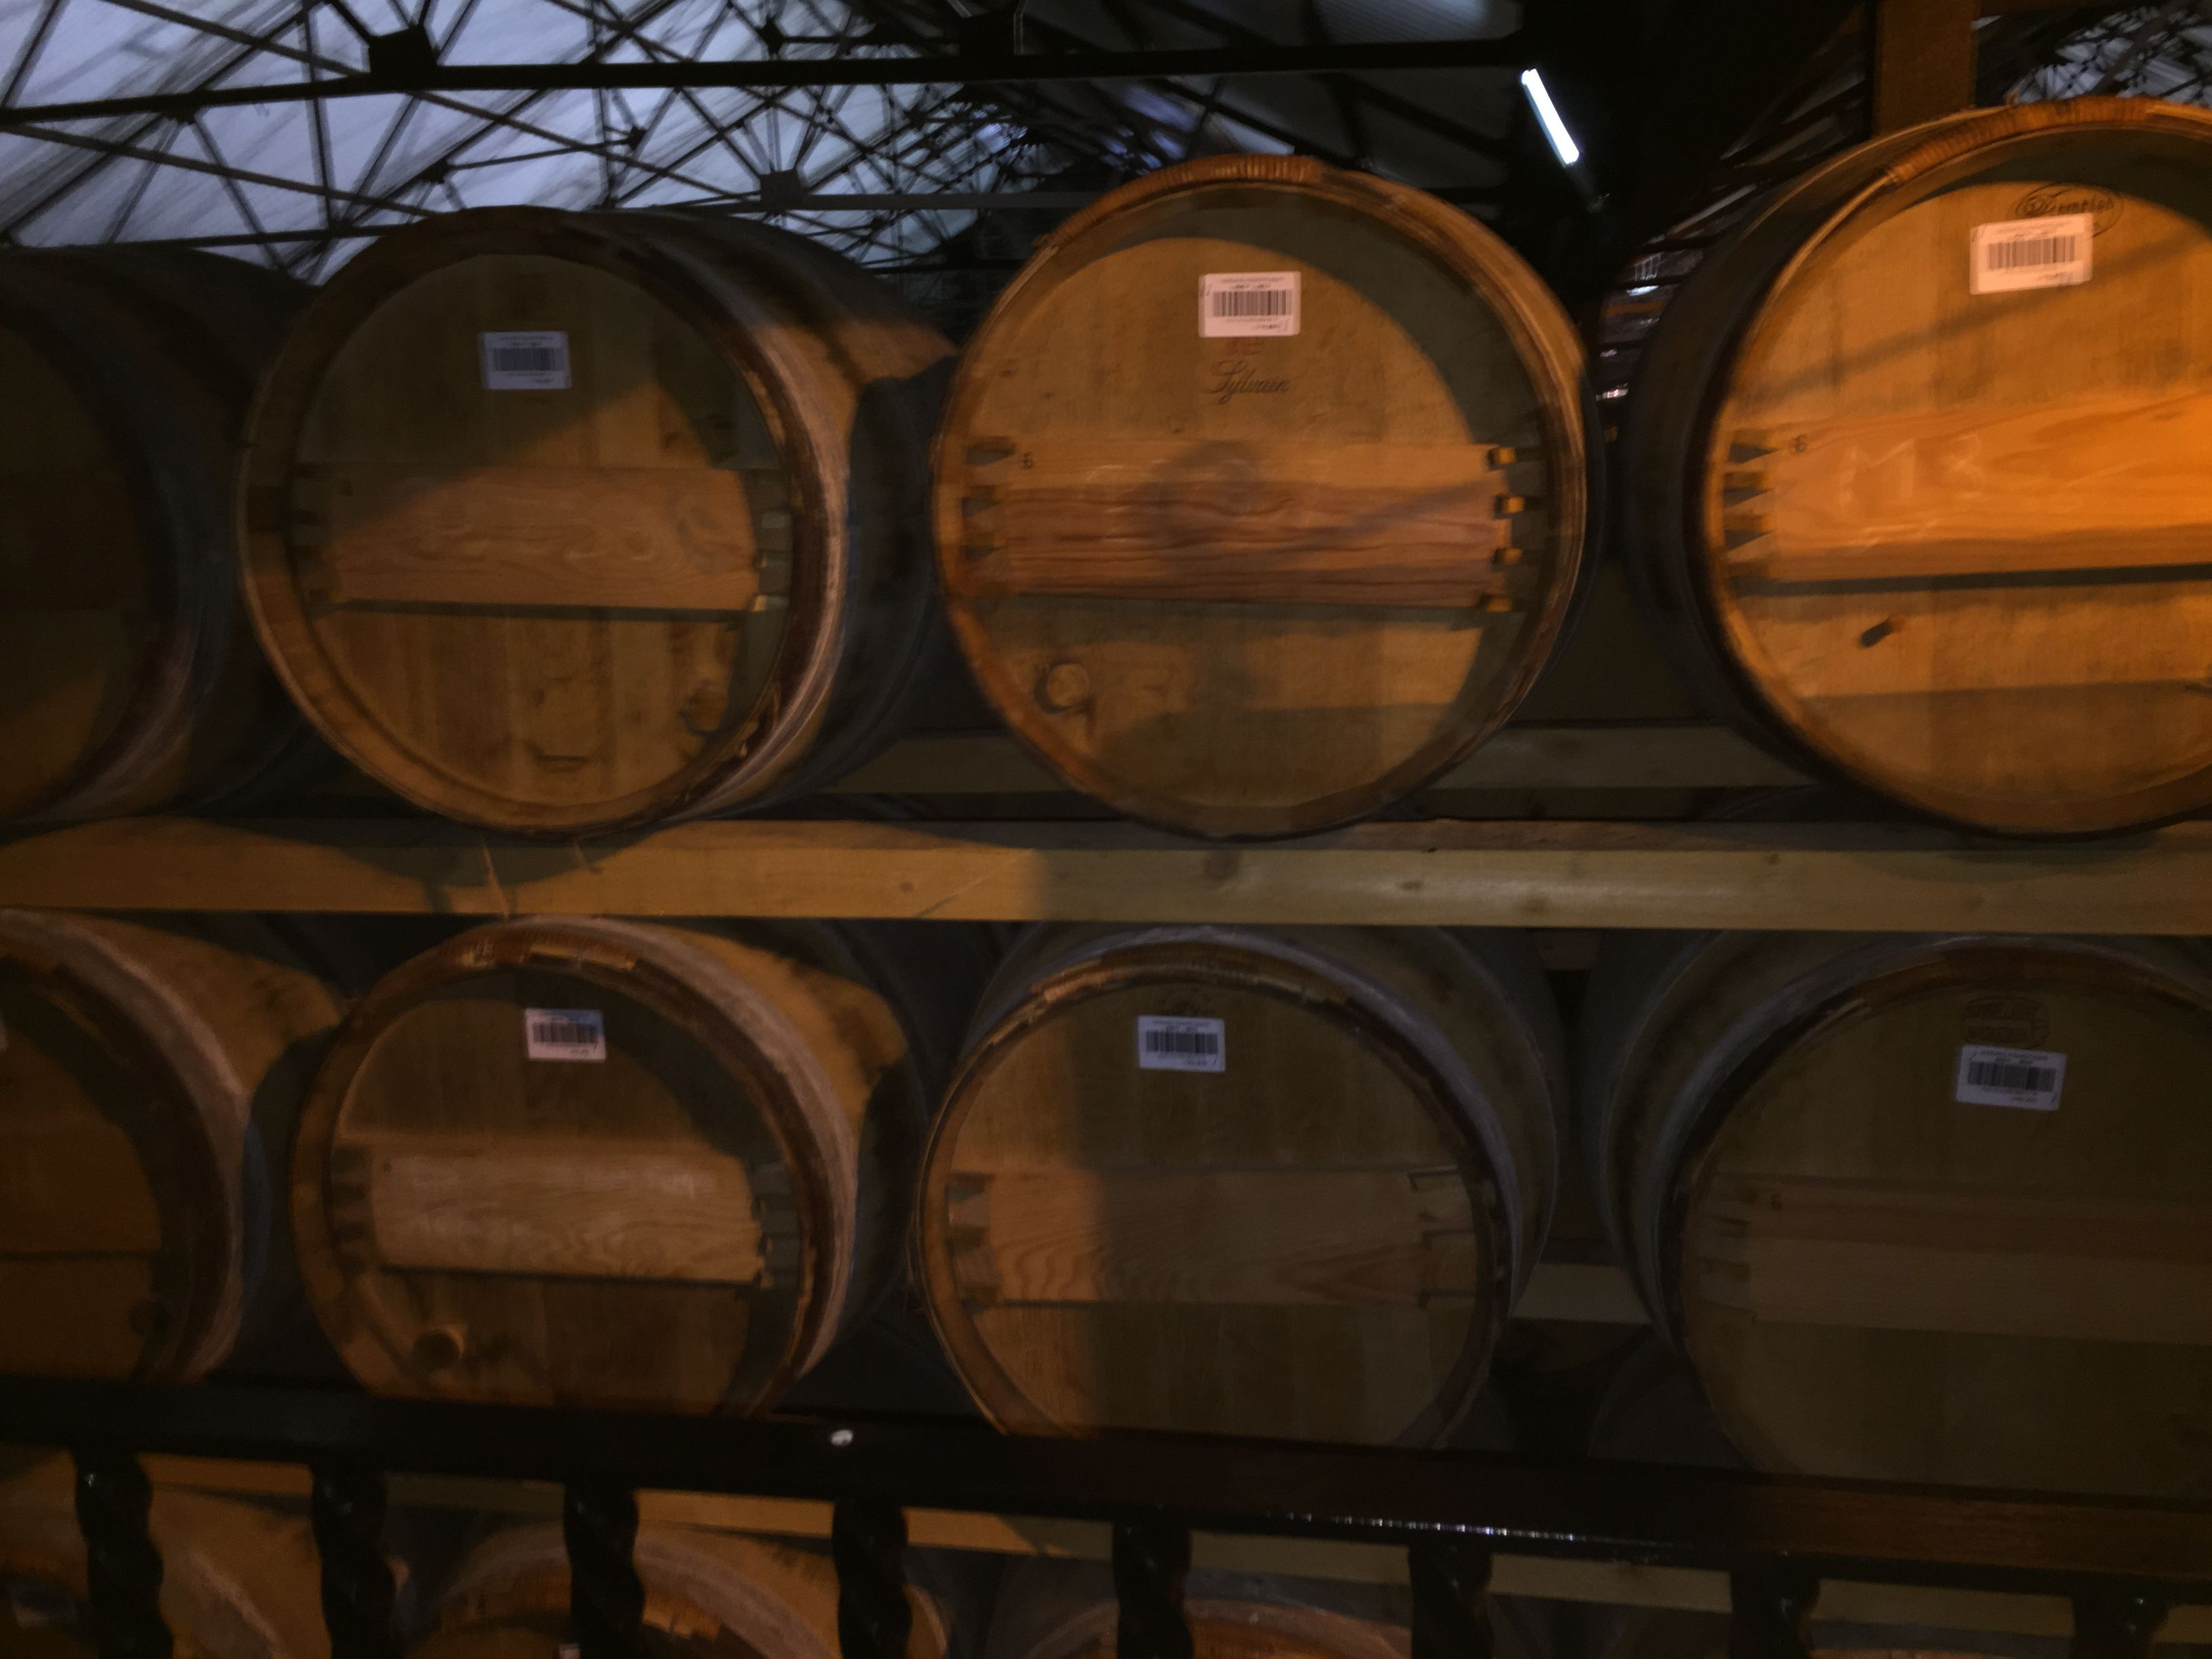 stacked oak barrels maturing red wine. 17 Wine Barrel Wallpaper 1920x1200 Wine, Barrel, Scotch 1639 | Cheese Pinterest Barrels, And Stacked Oak Barrels Maturing Red